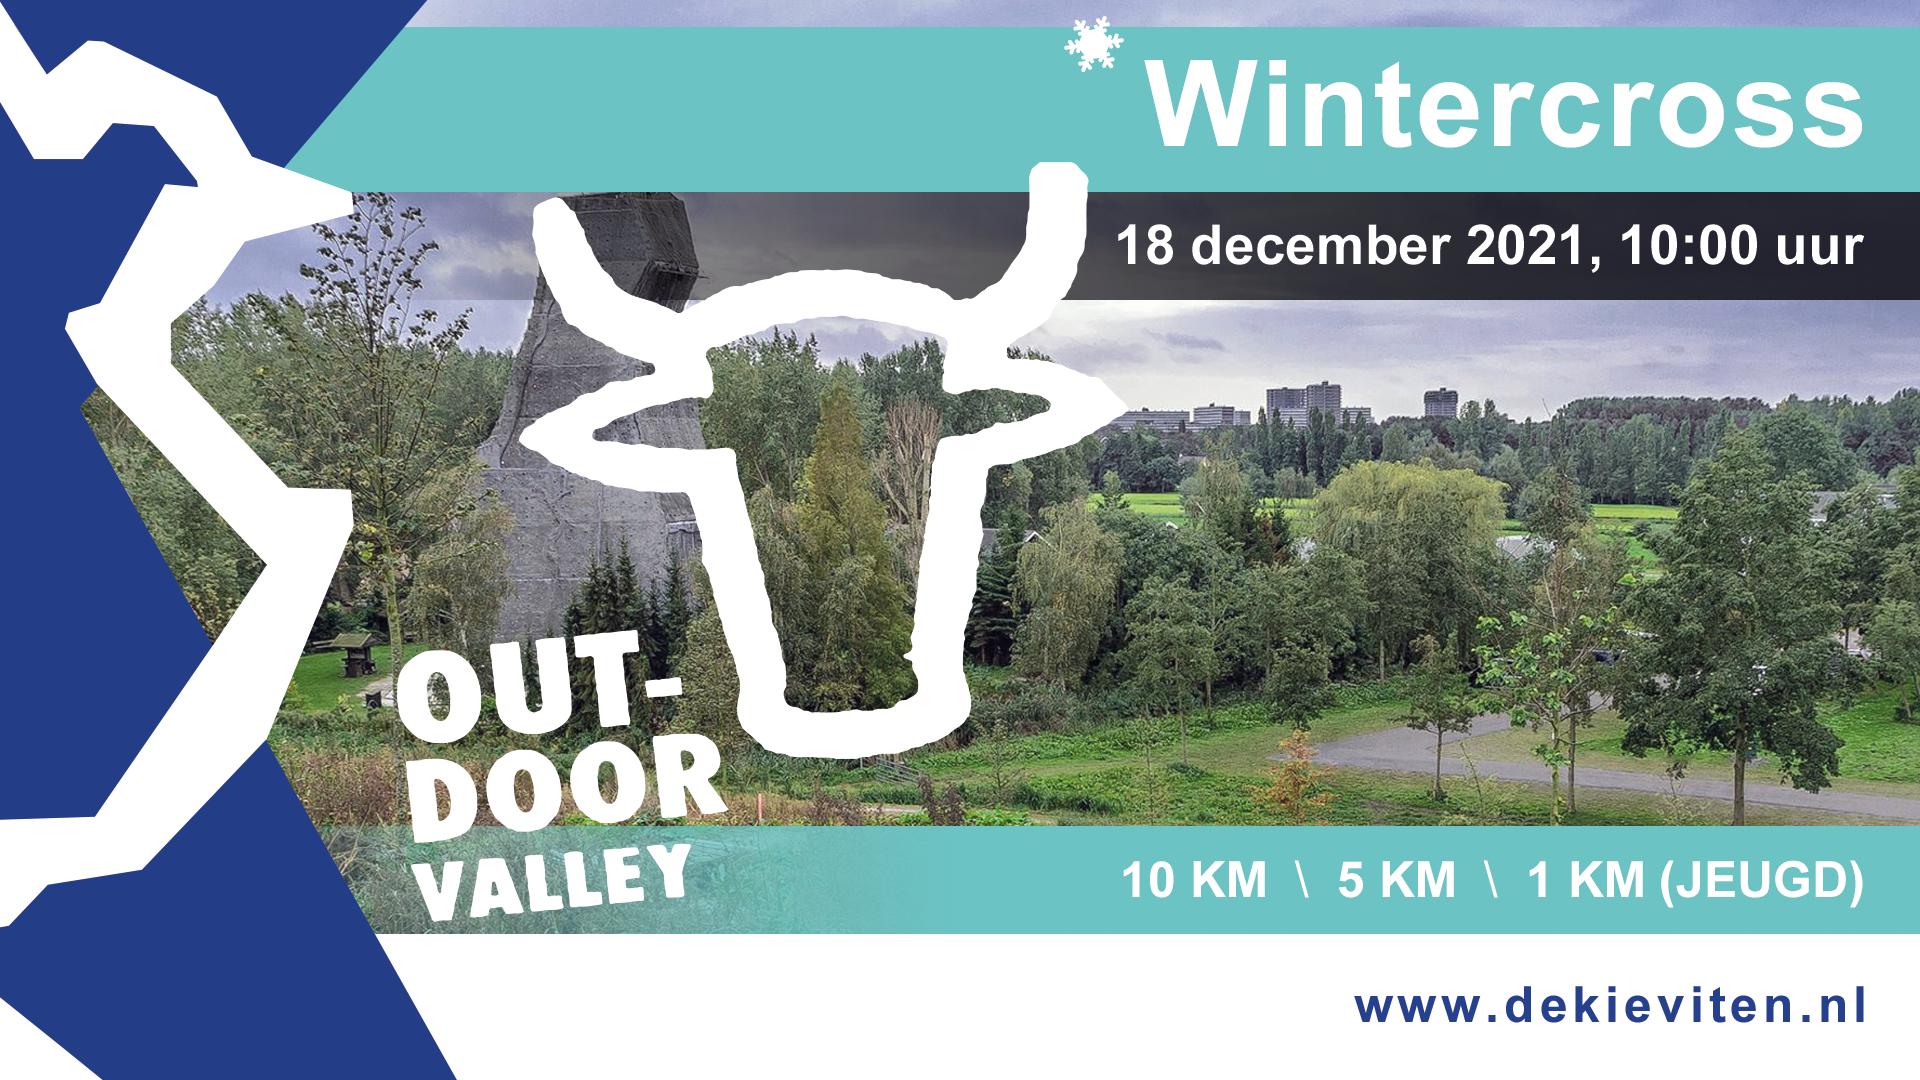 2021_kieviten_events_wintercross.jpg